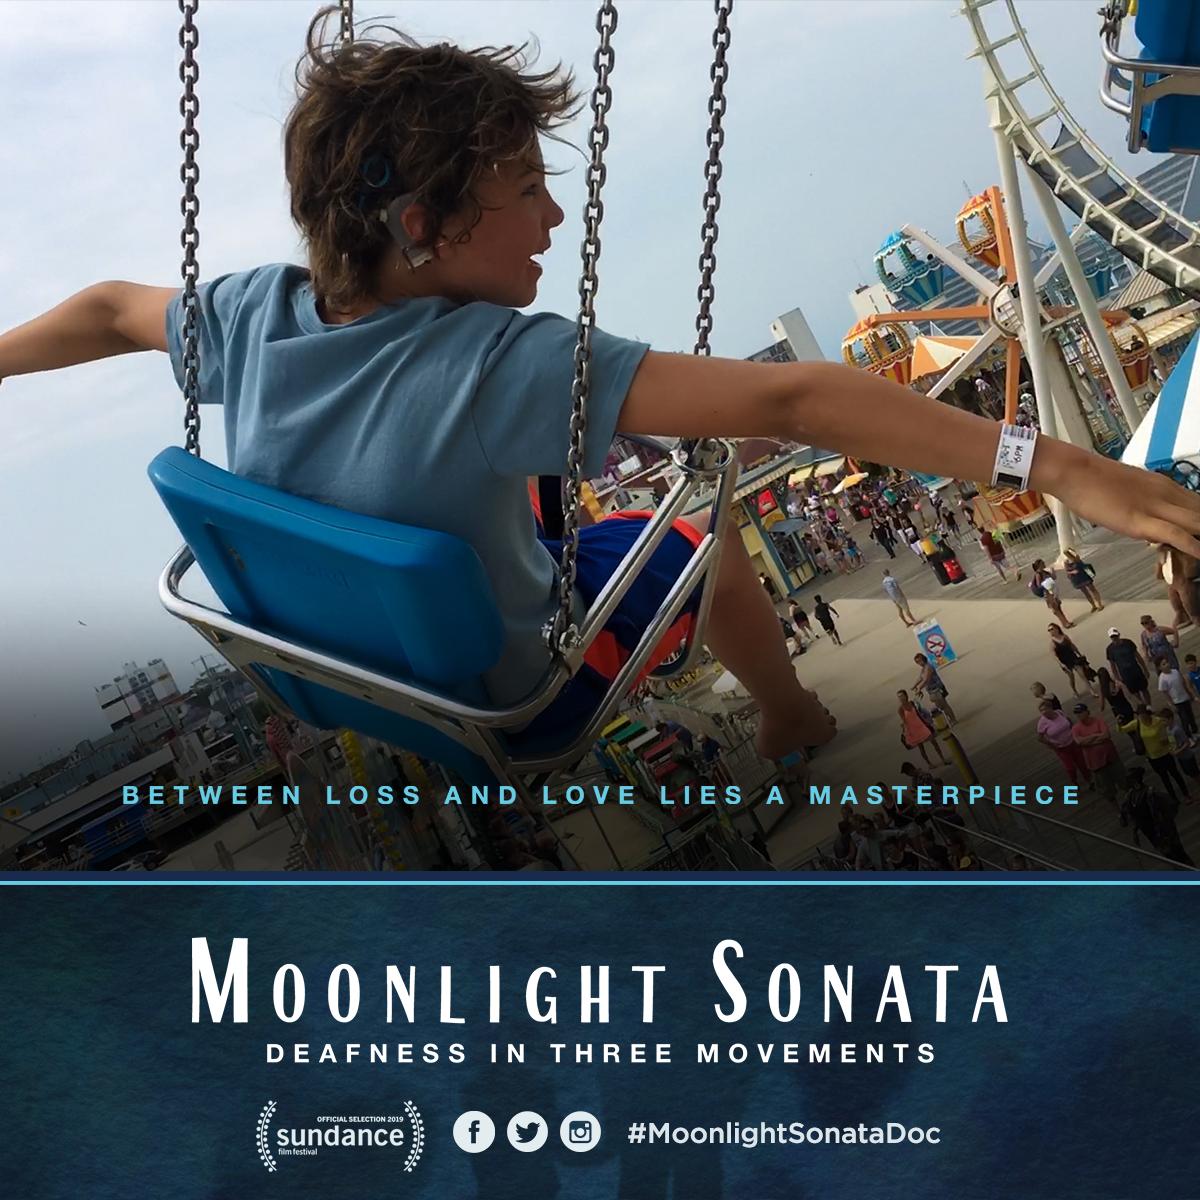 MoonlightSonata_1200x1200_3.png